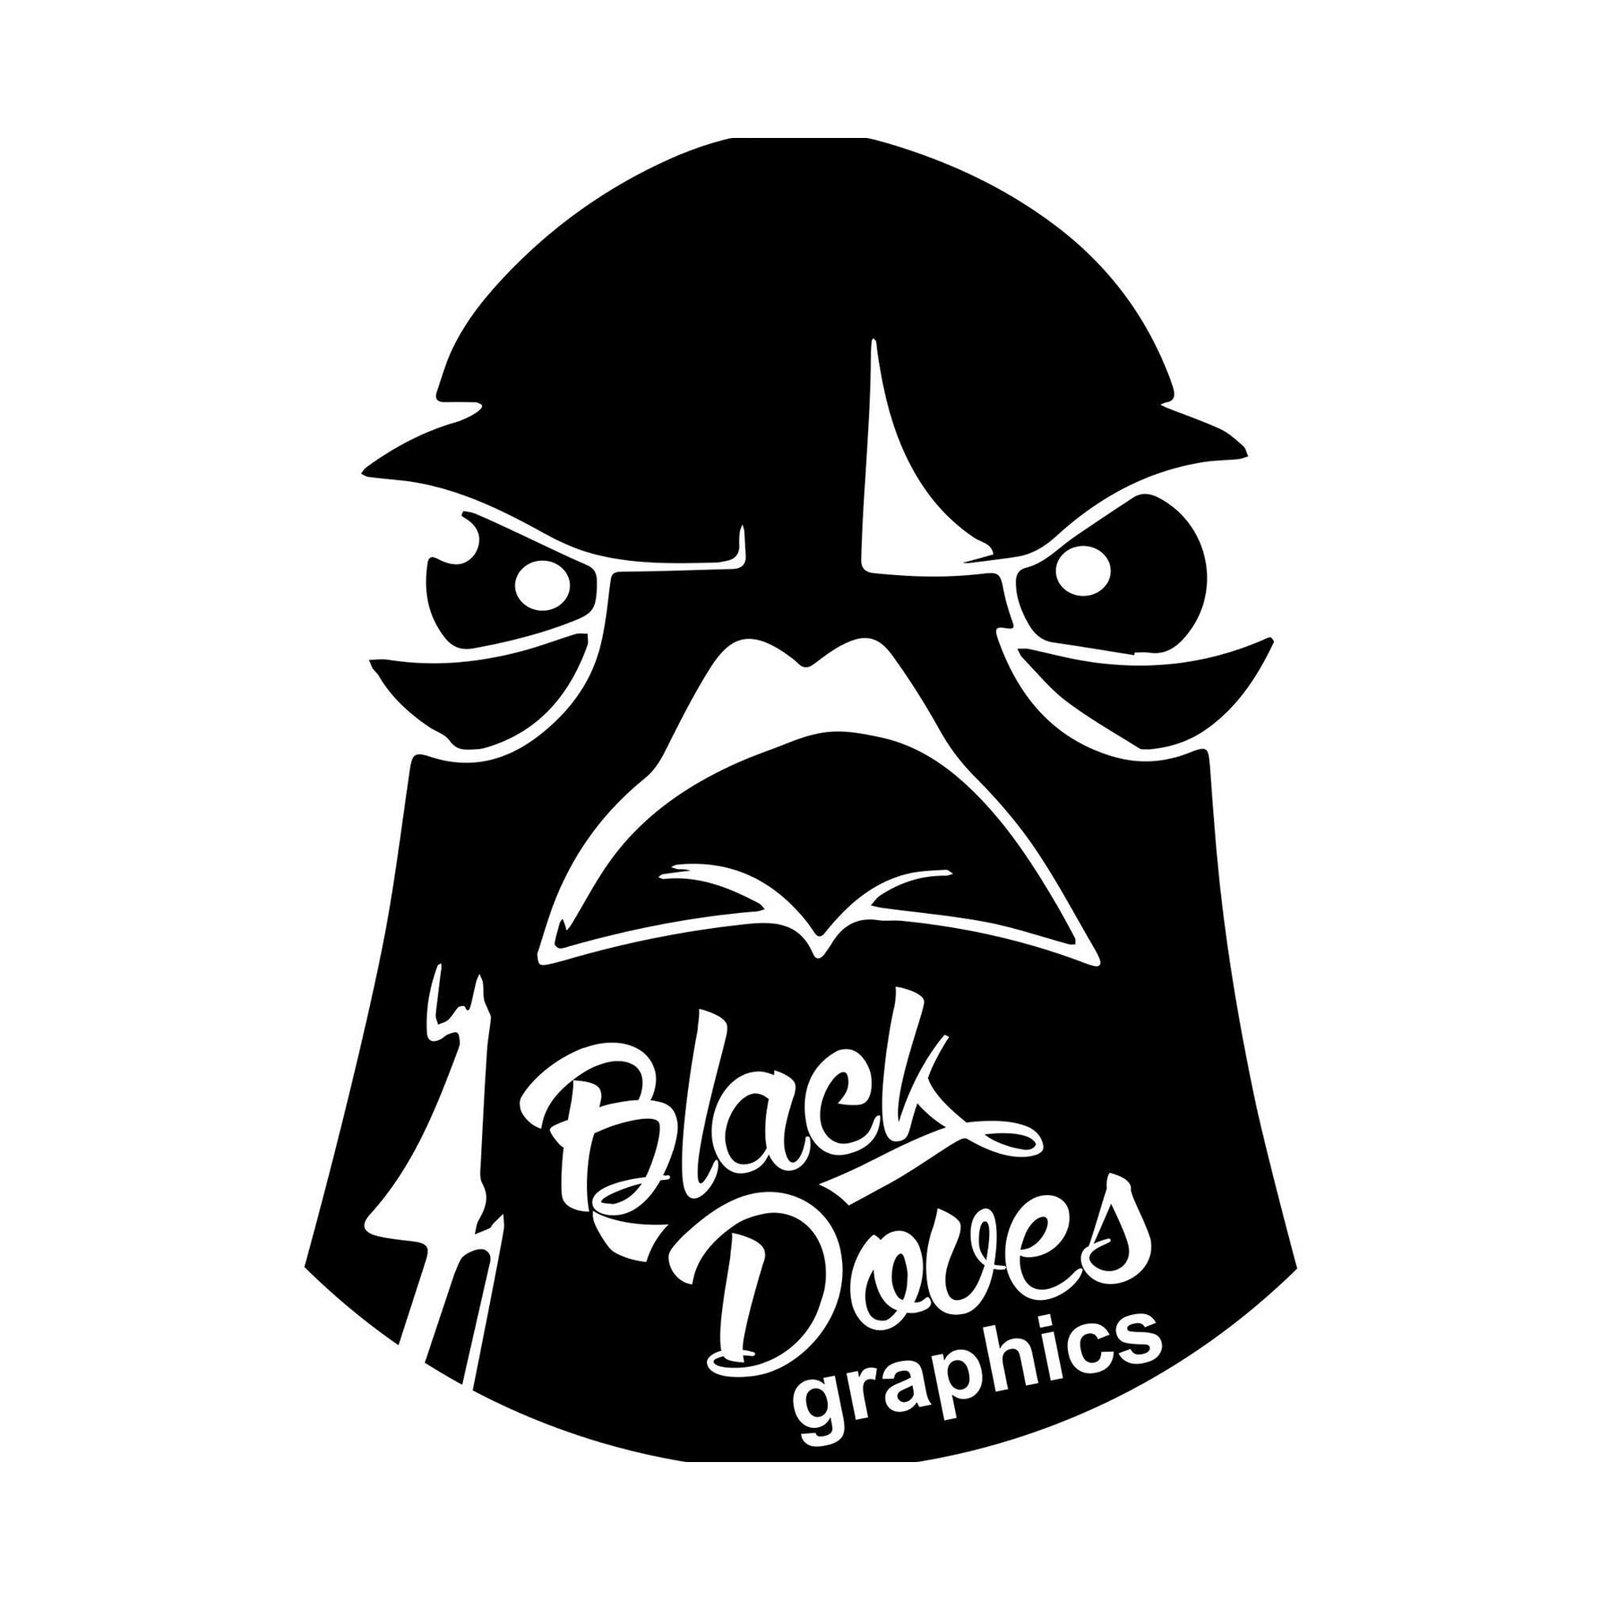 Black Doves Graphics